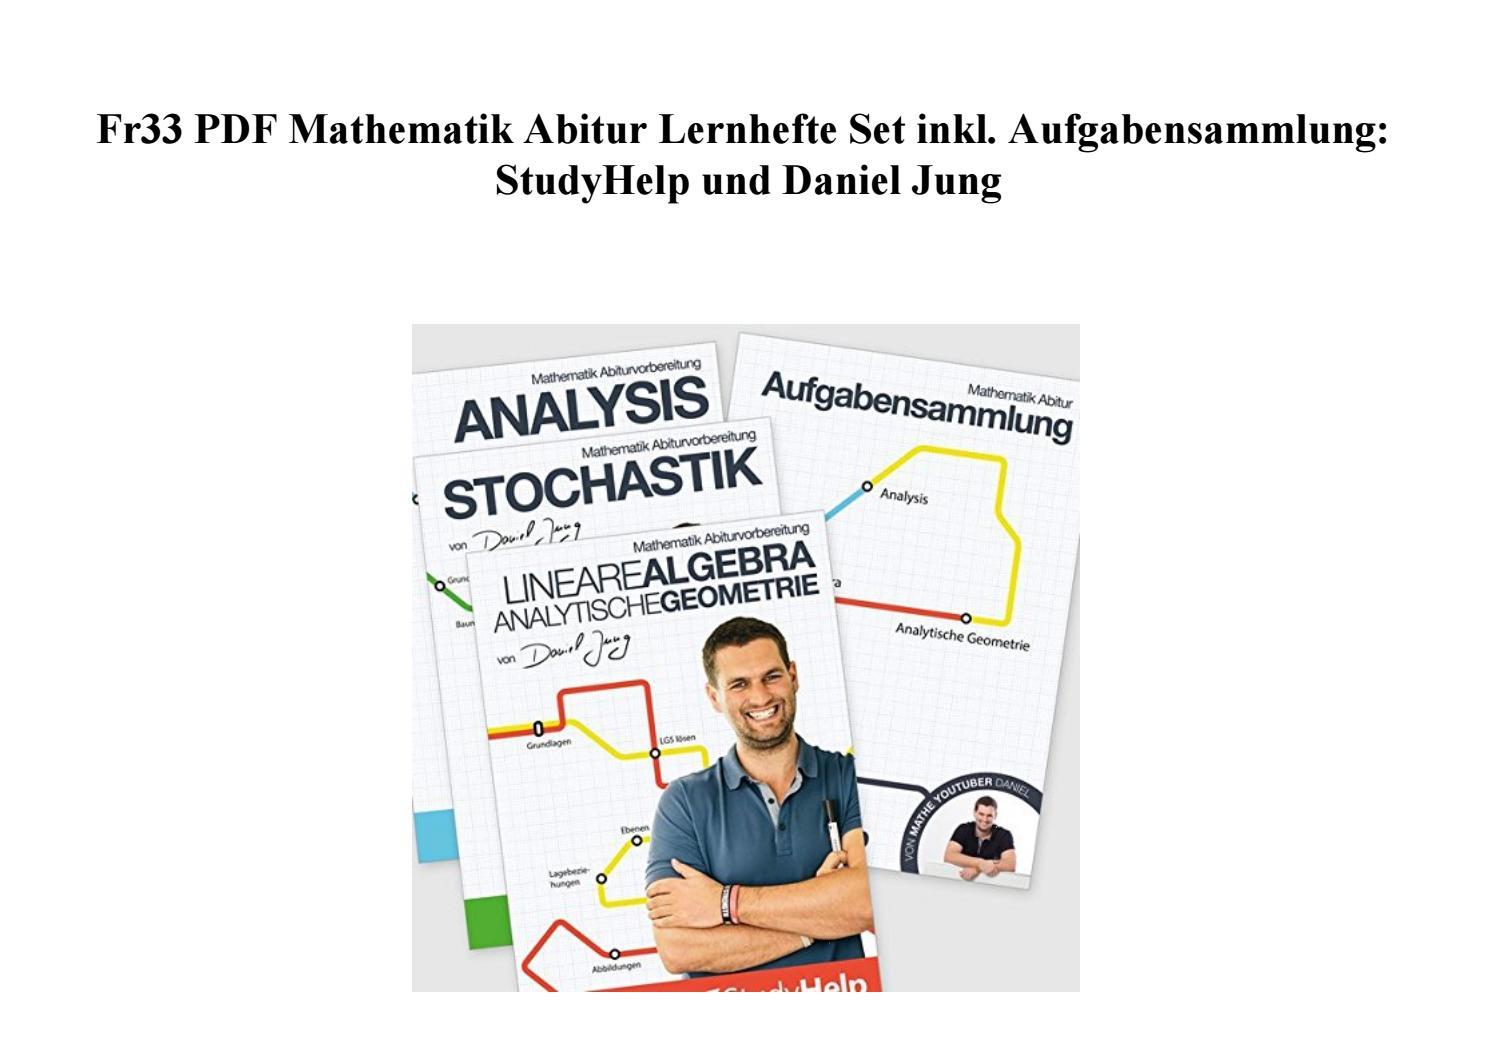 Fr20 PDF Mathematik Abitur Lernhefte Set inkl. Aufgabensammlung ...